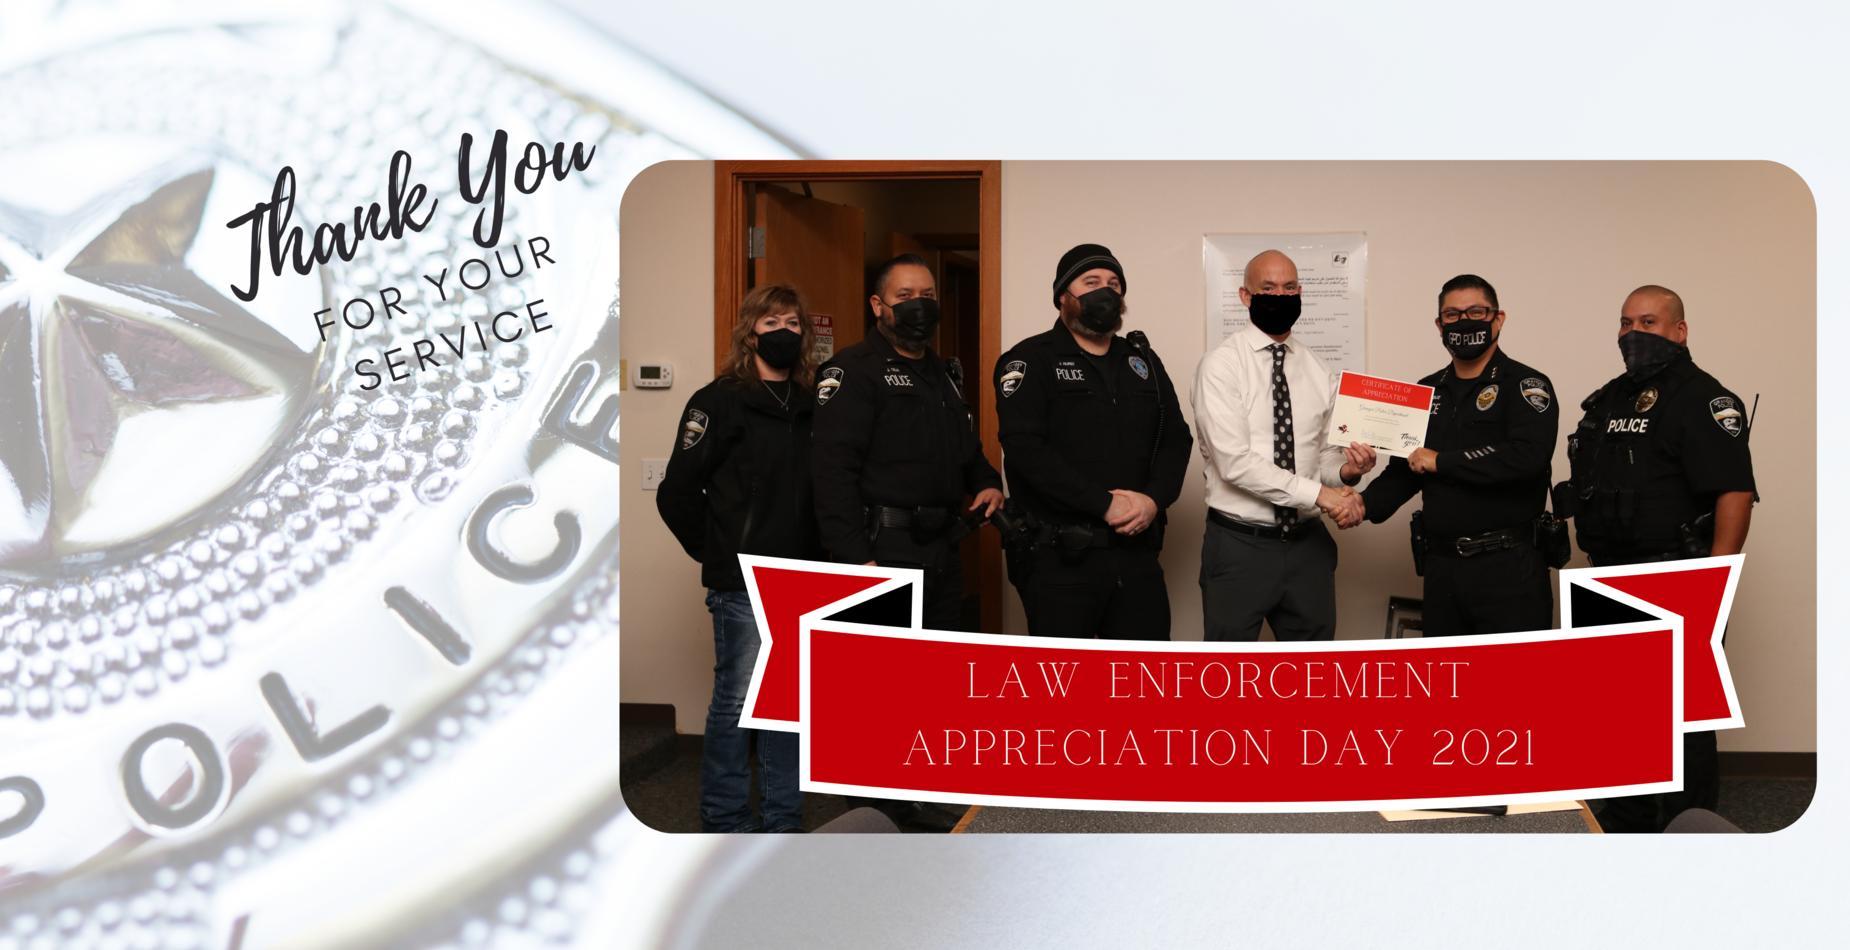 Law Enforcement day photo